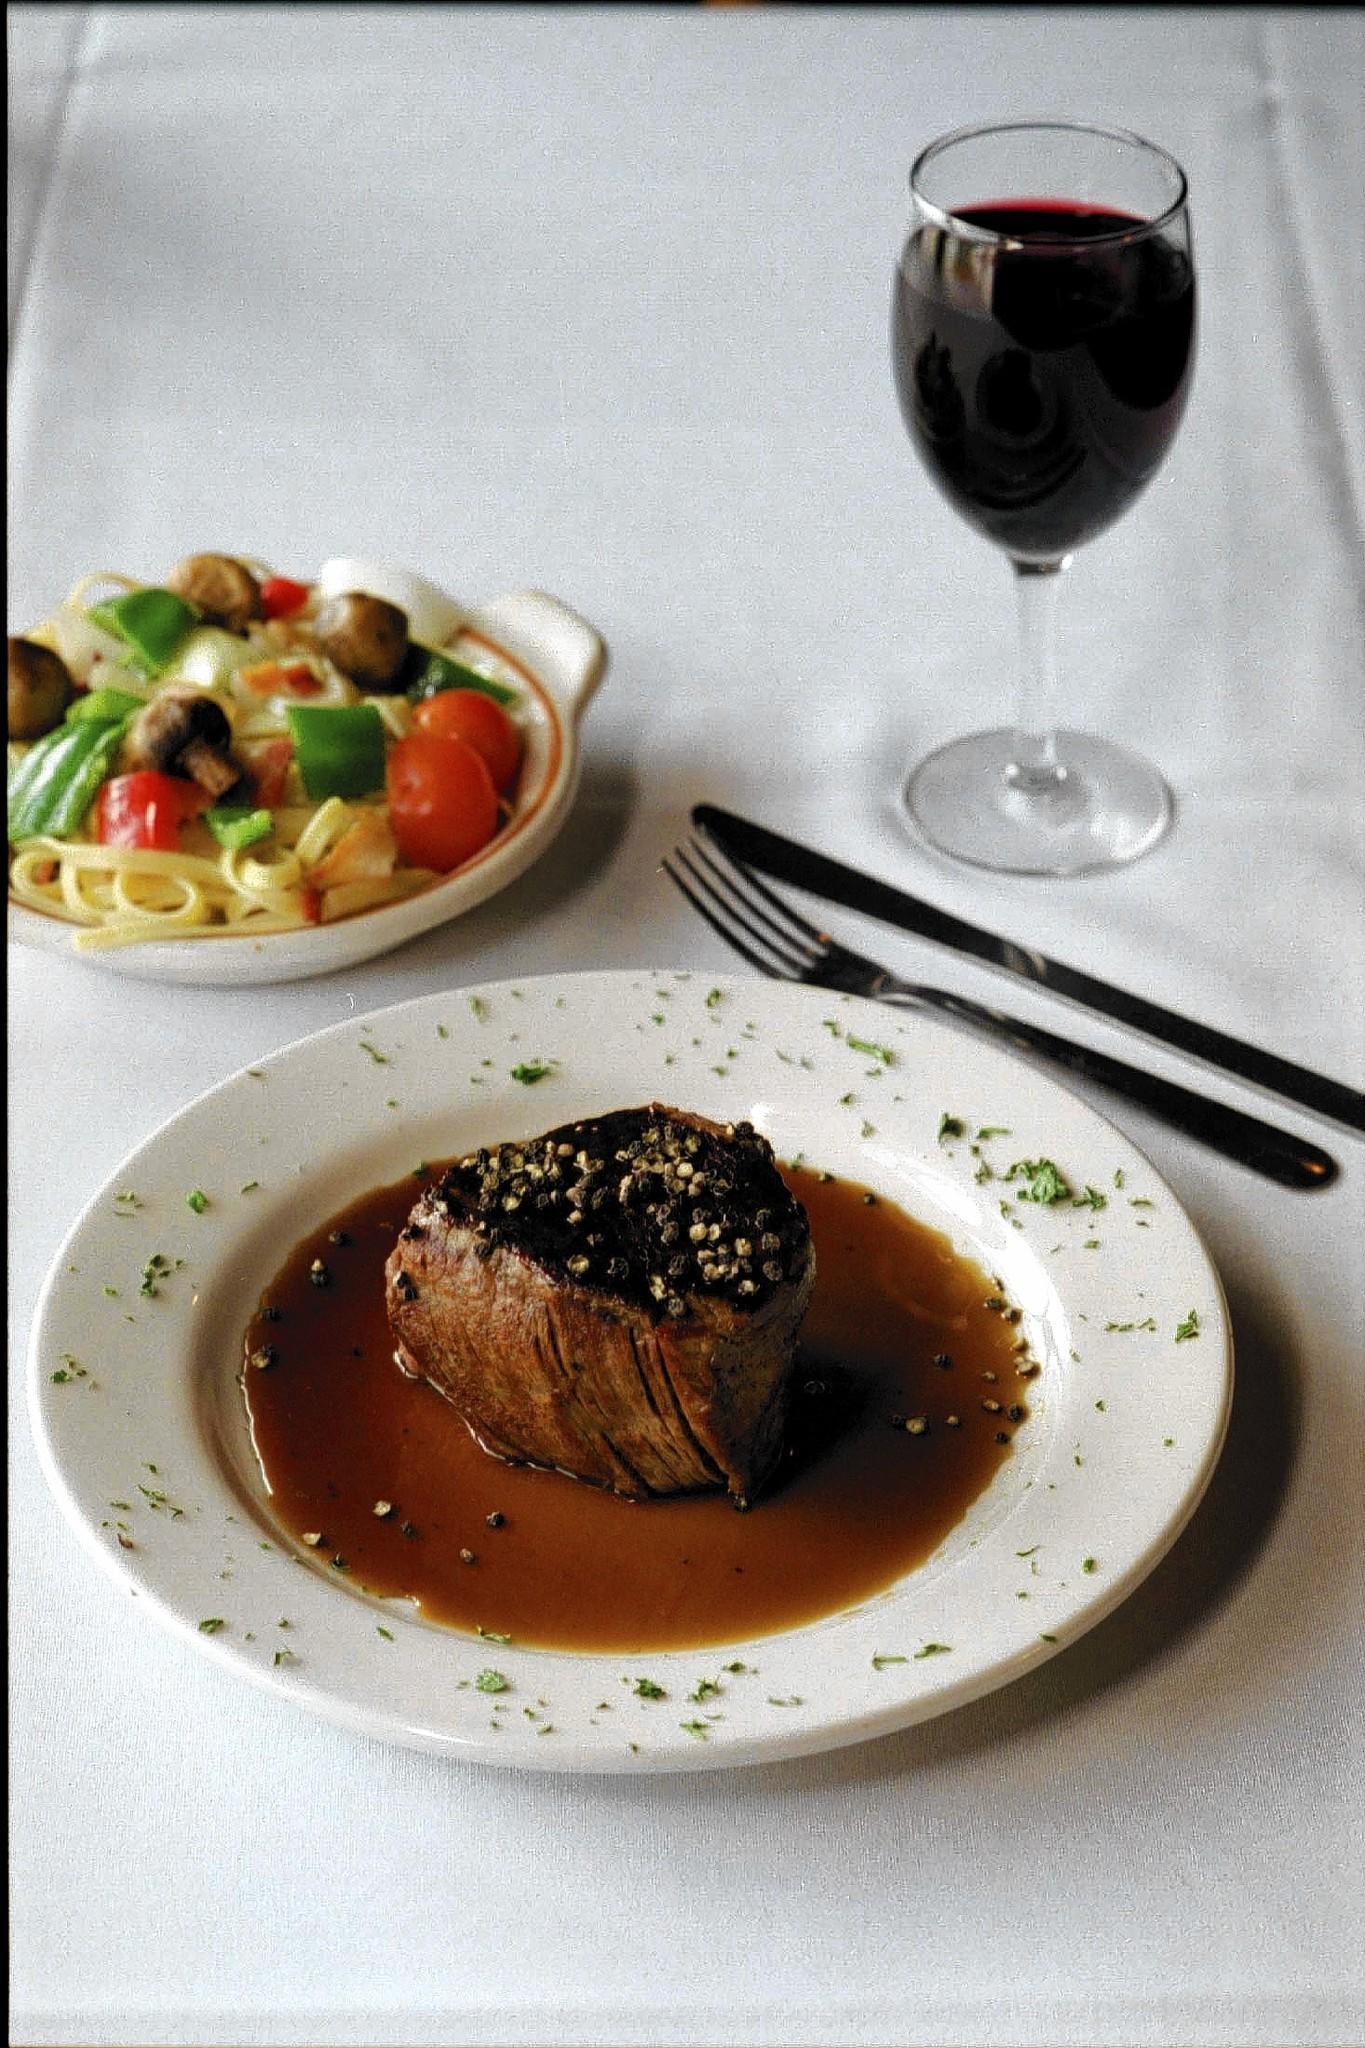 Brown sugar and cracked black pepper flavor Townsend's Bourbon Steak.